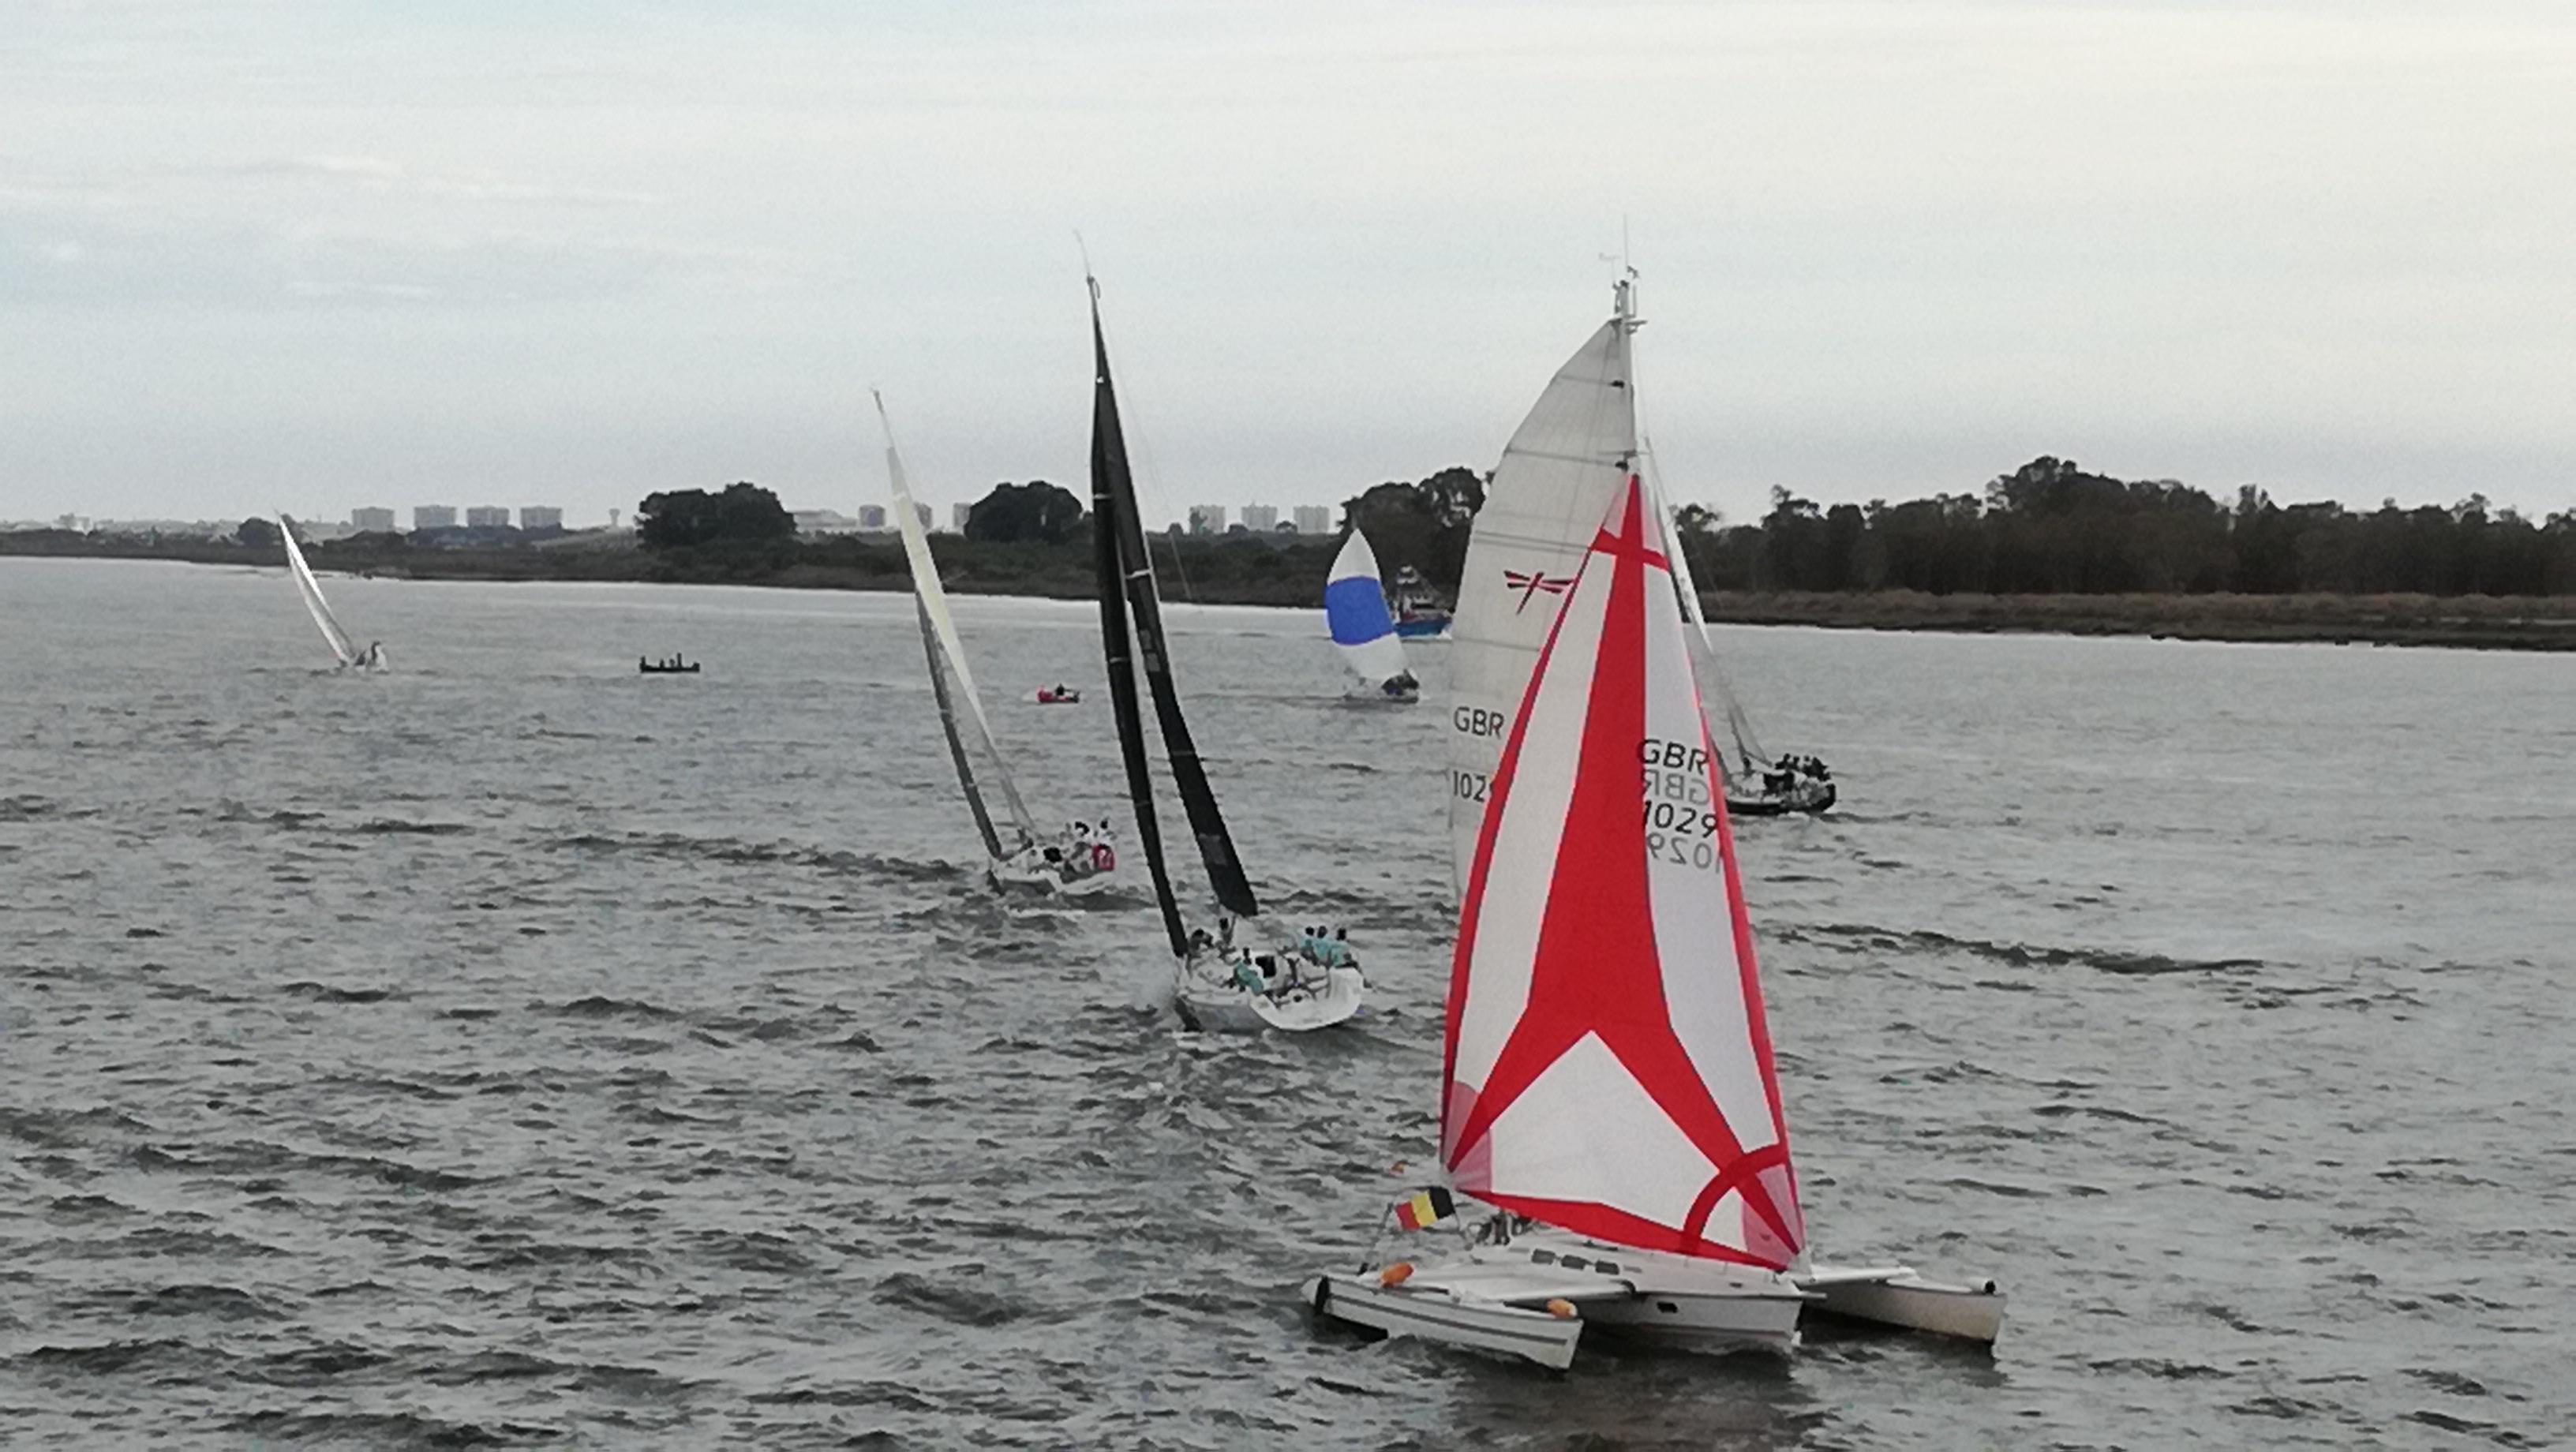 Campeonato De Andalucía De Cruceros Circuito